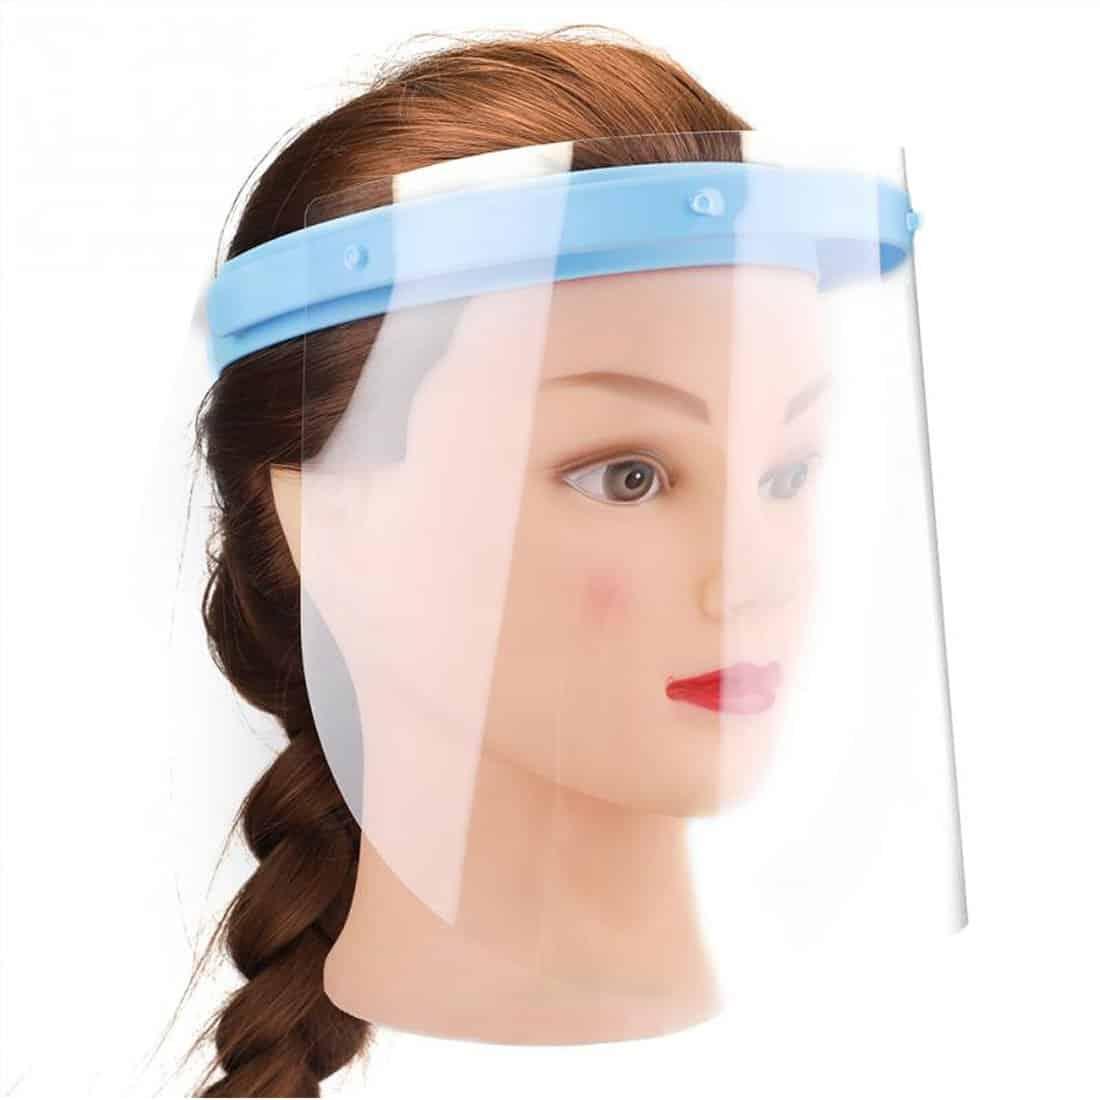 Wecando Anti-fog Adjustable Dental Face Shield